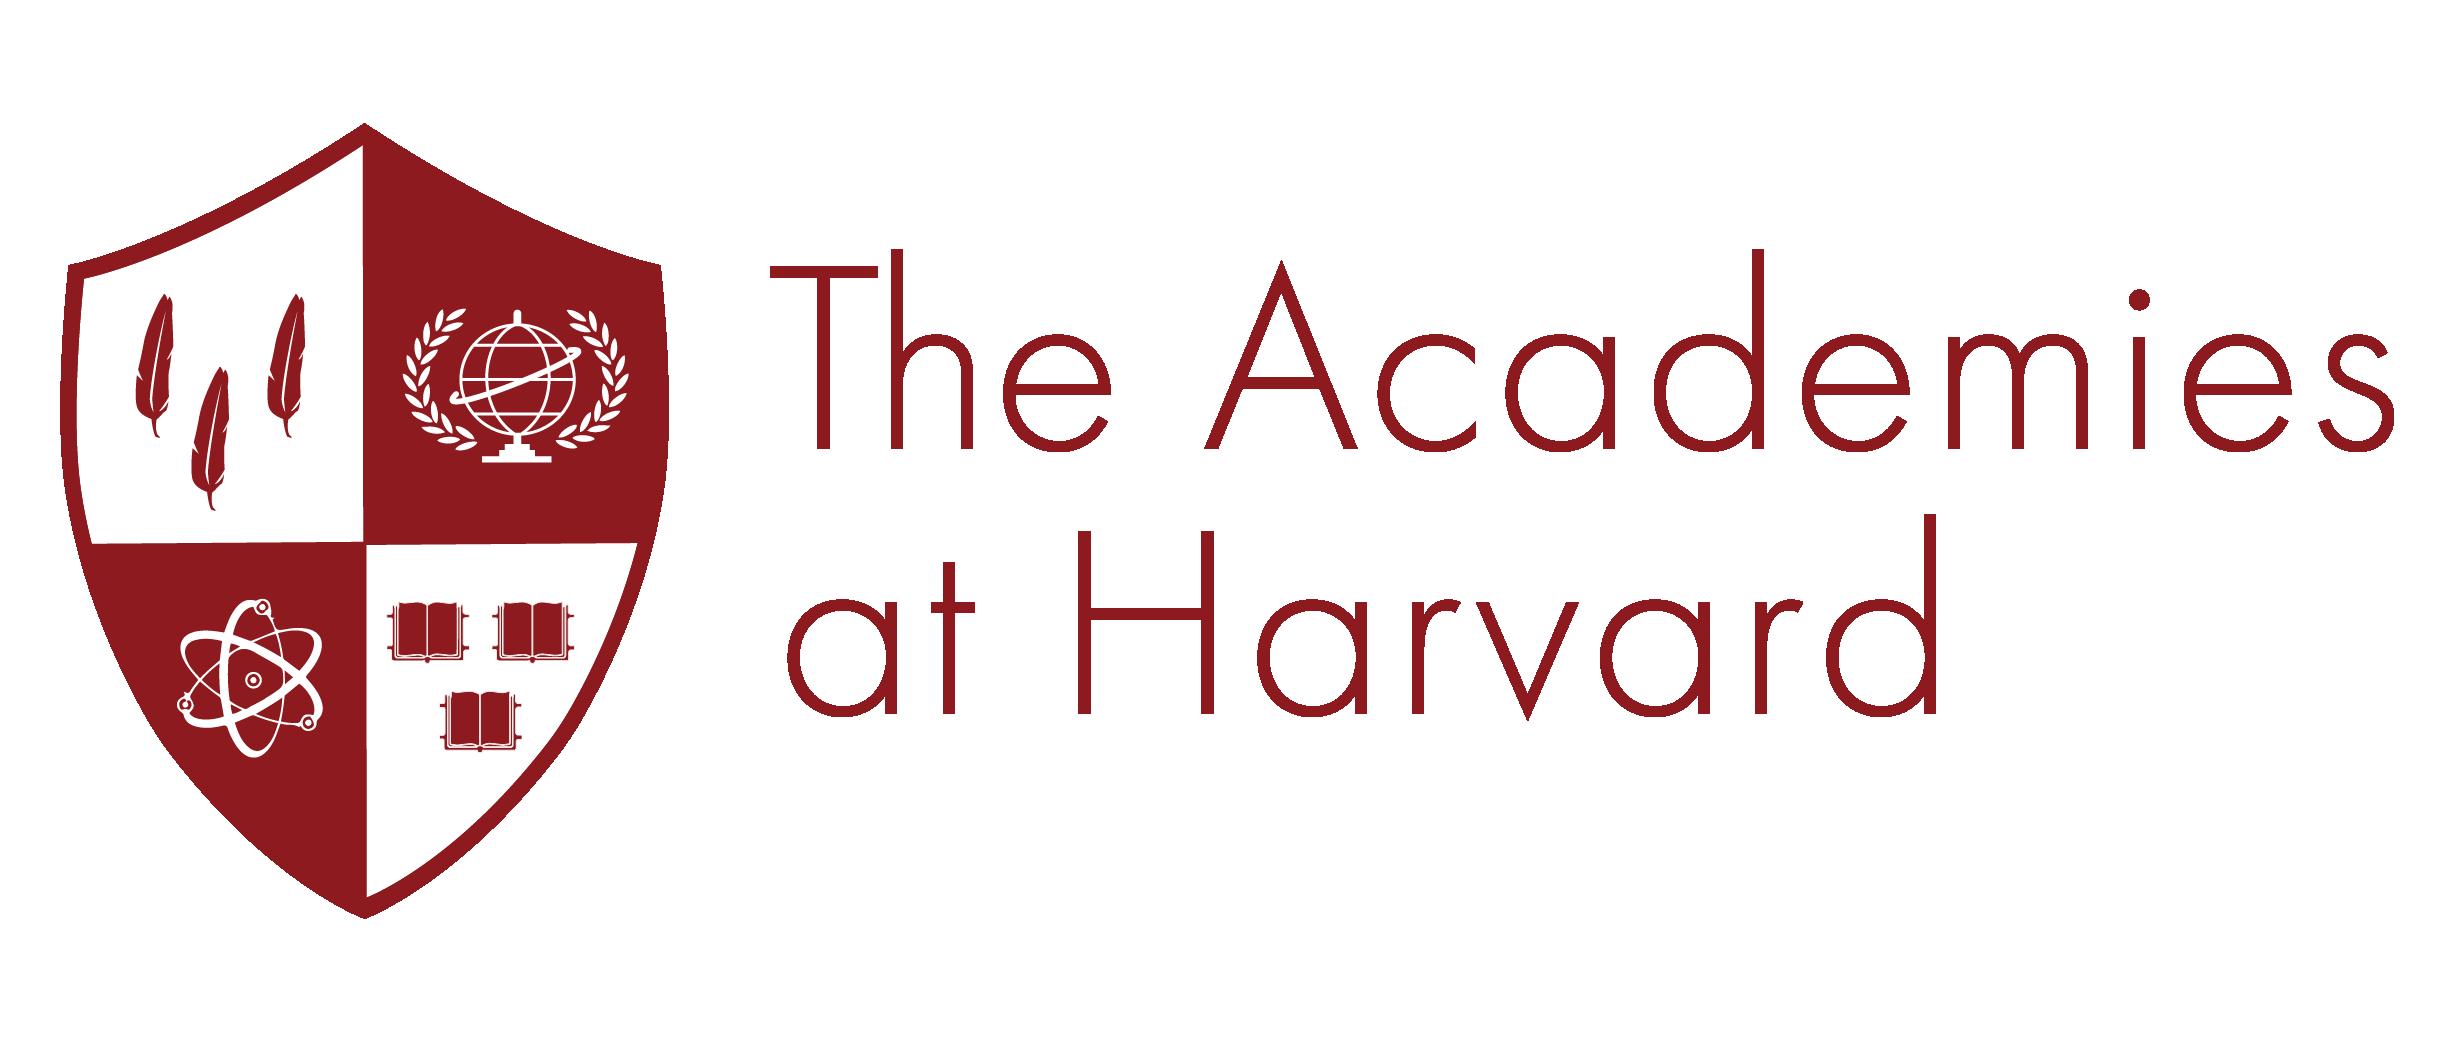 The Academies at Harvard